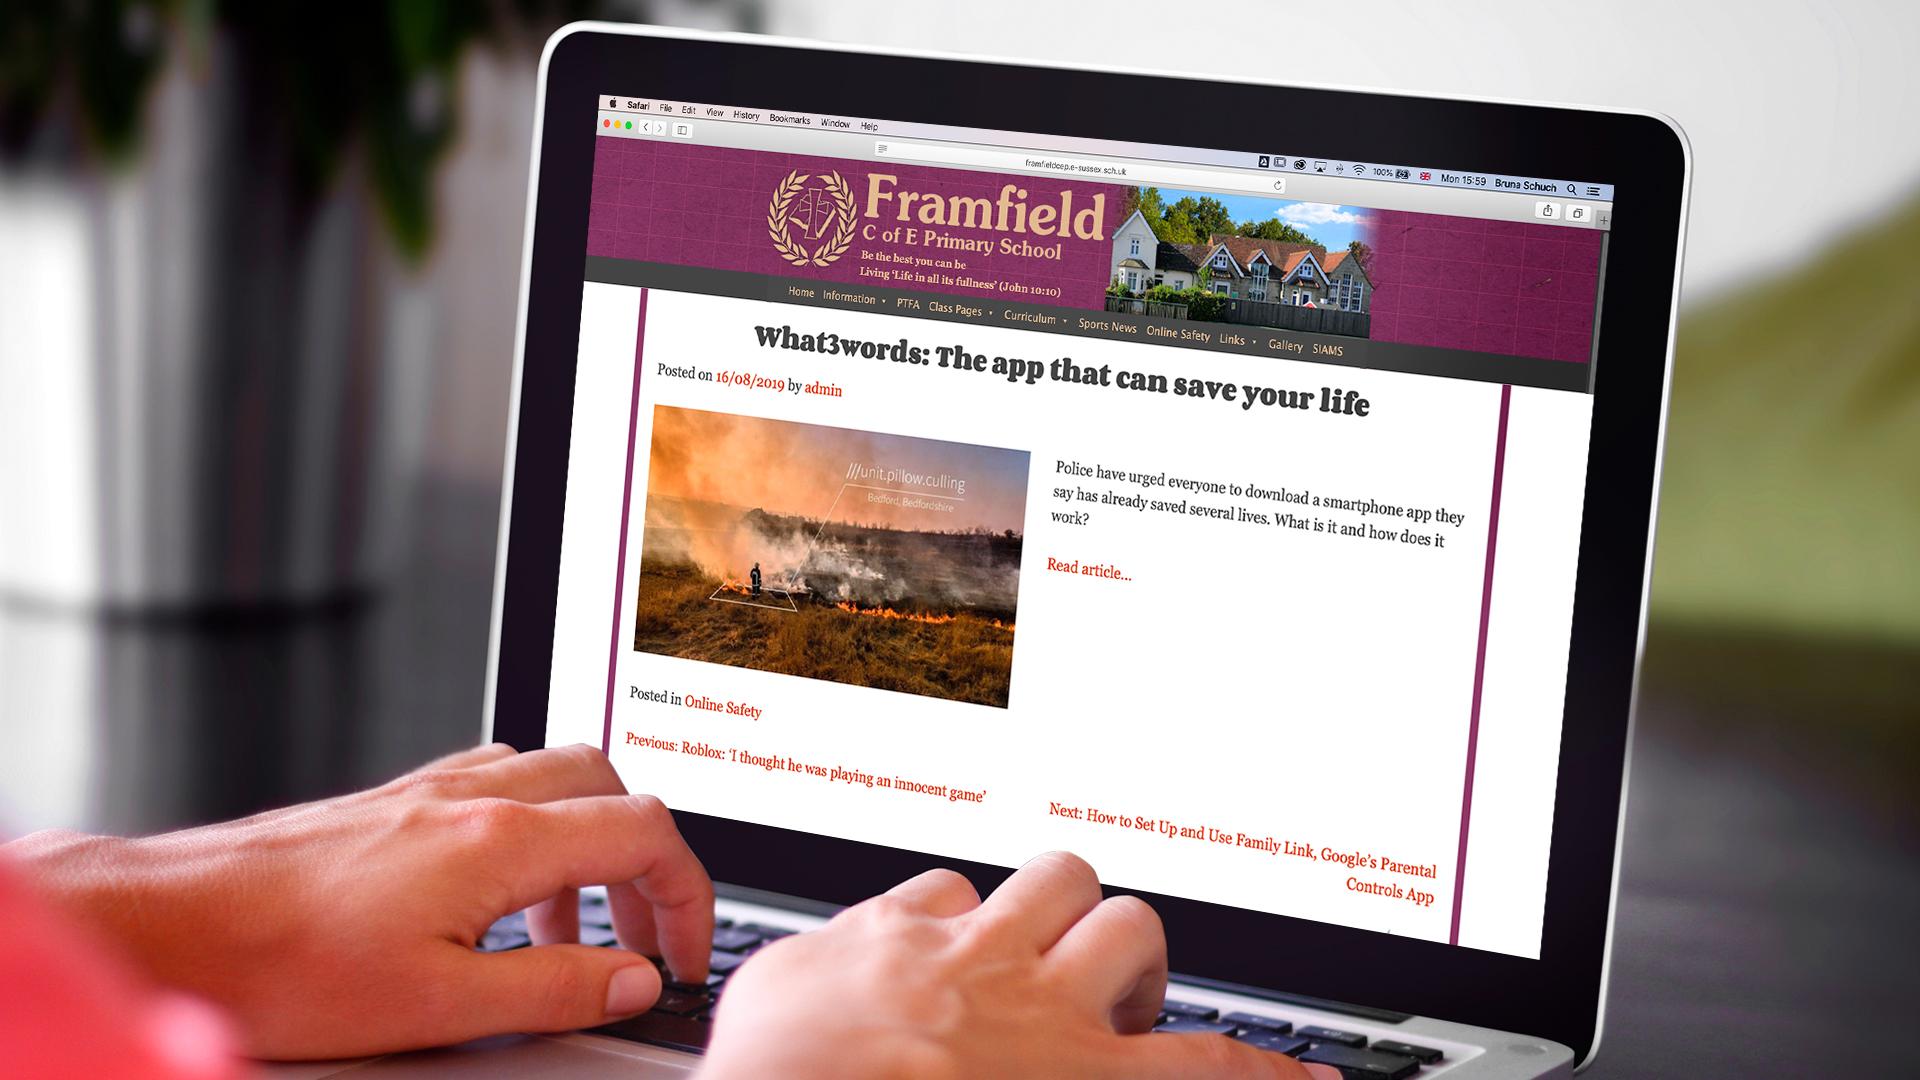 website of Framfield emergency news on a laptop